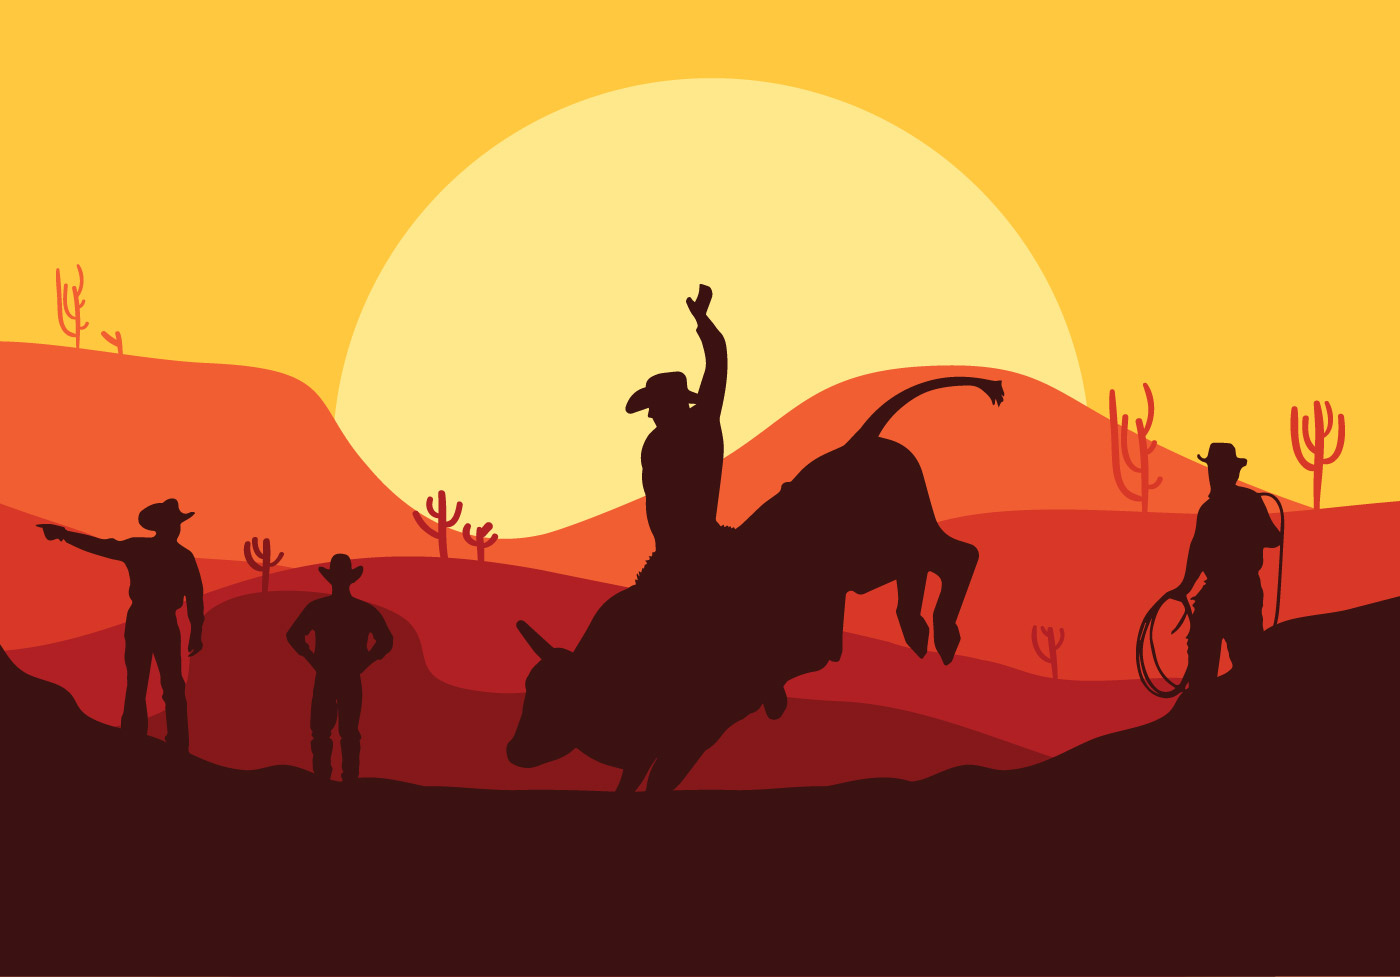 bull rider vector download free vector art  stock bull riding clip art black and white bull riding clip art free